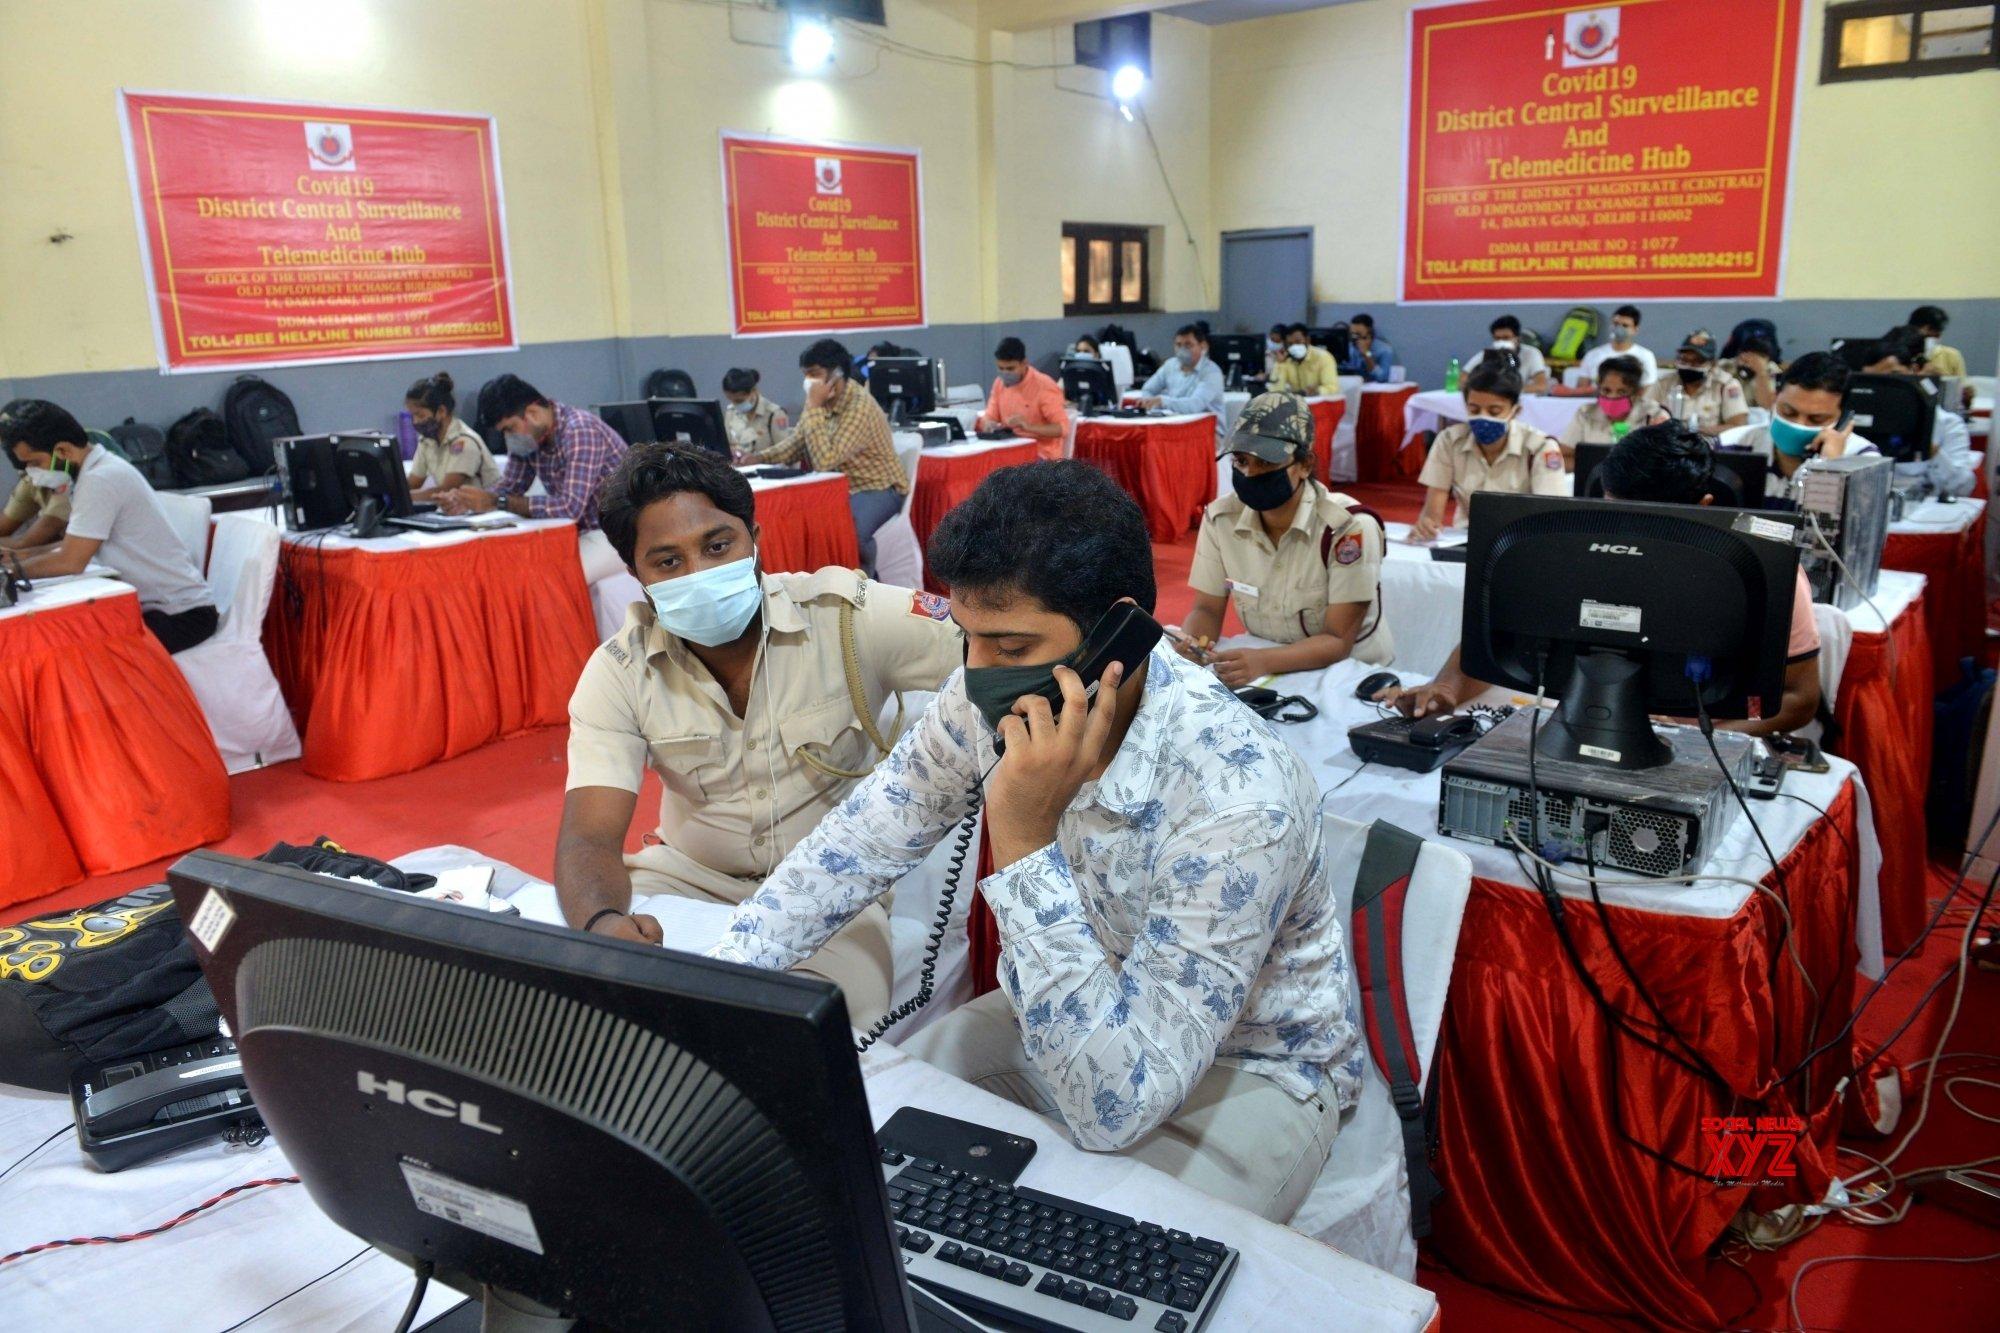 New Delhi: COVID - 19 District central surveillance and Telemedicine hub #Gallery